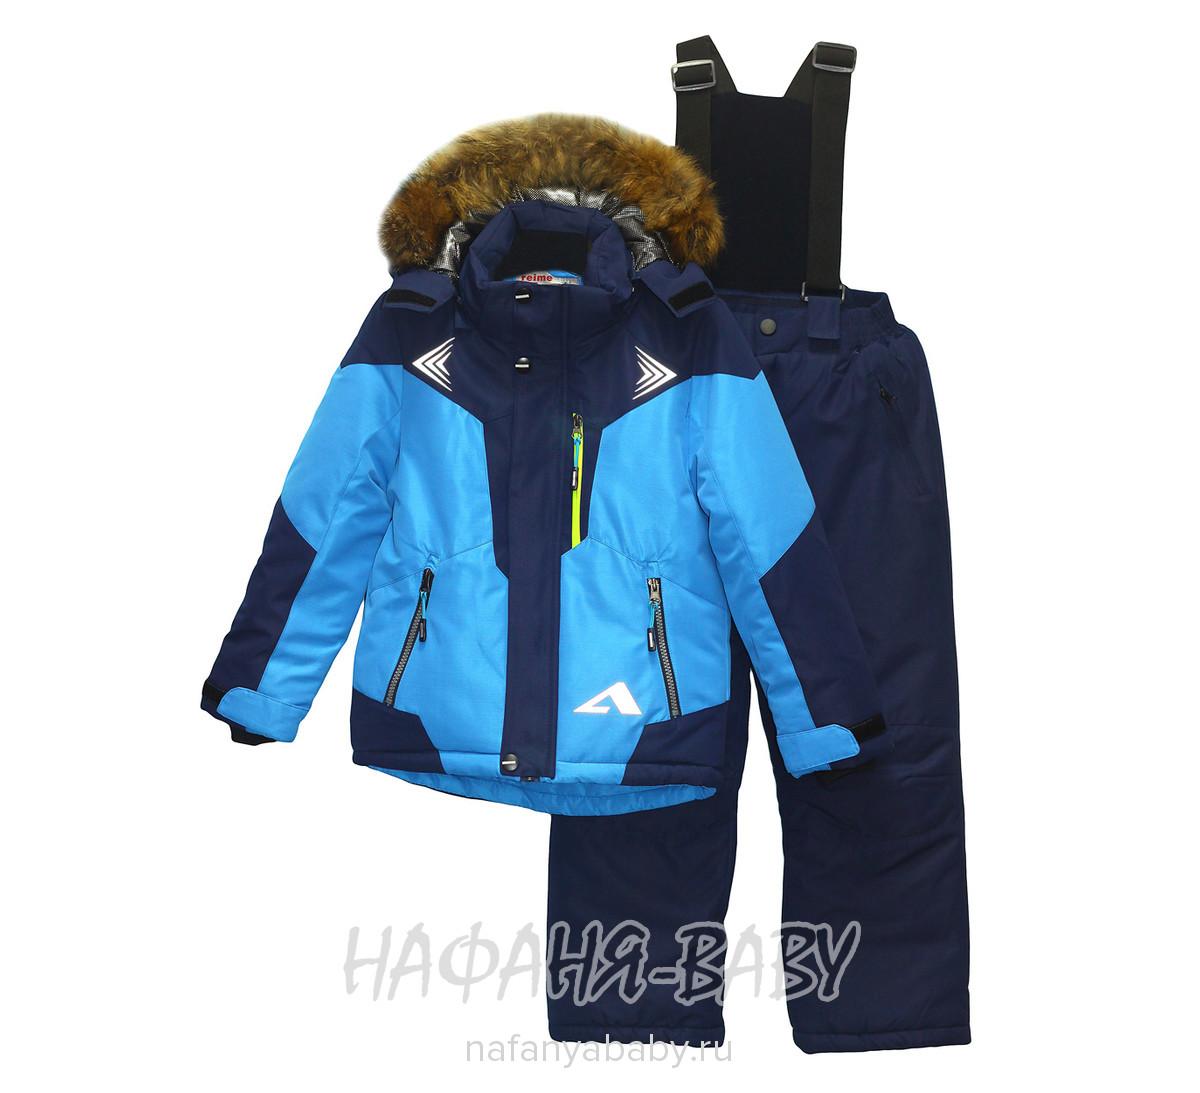 Детский зимний костюм для мальчиа